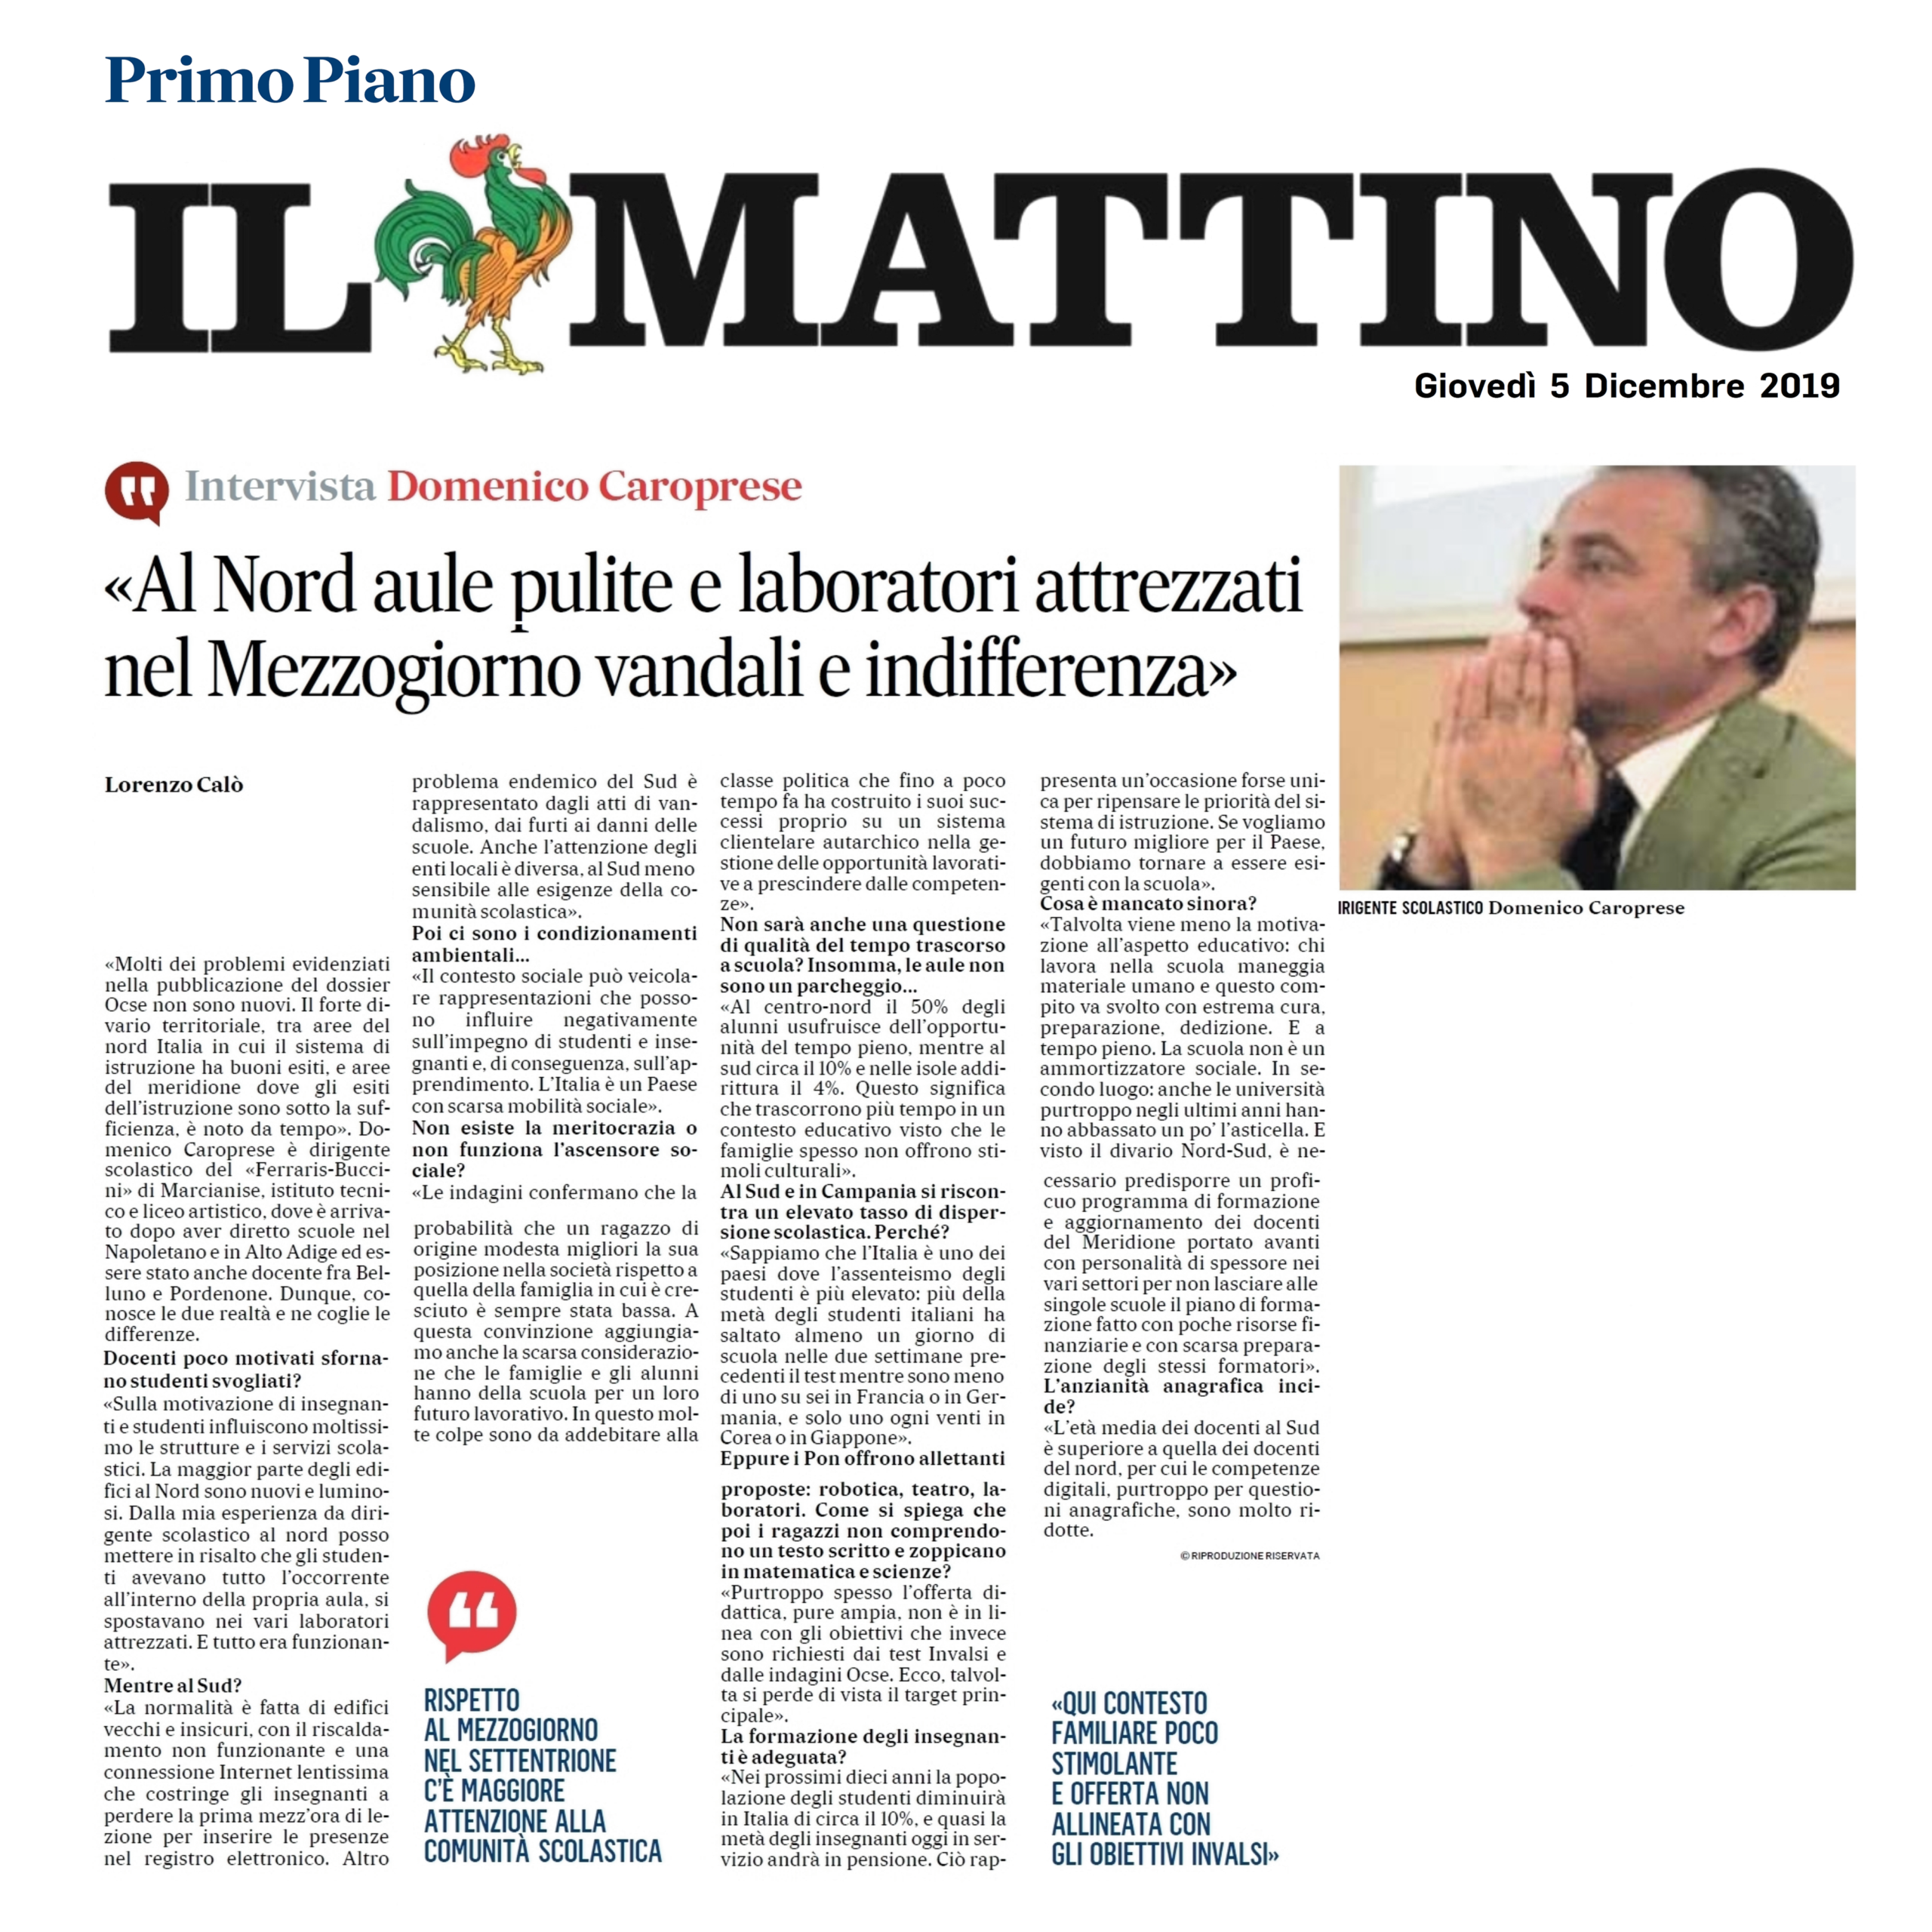 ilMattino_Intervista-Caroprese